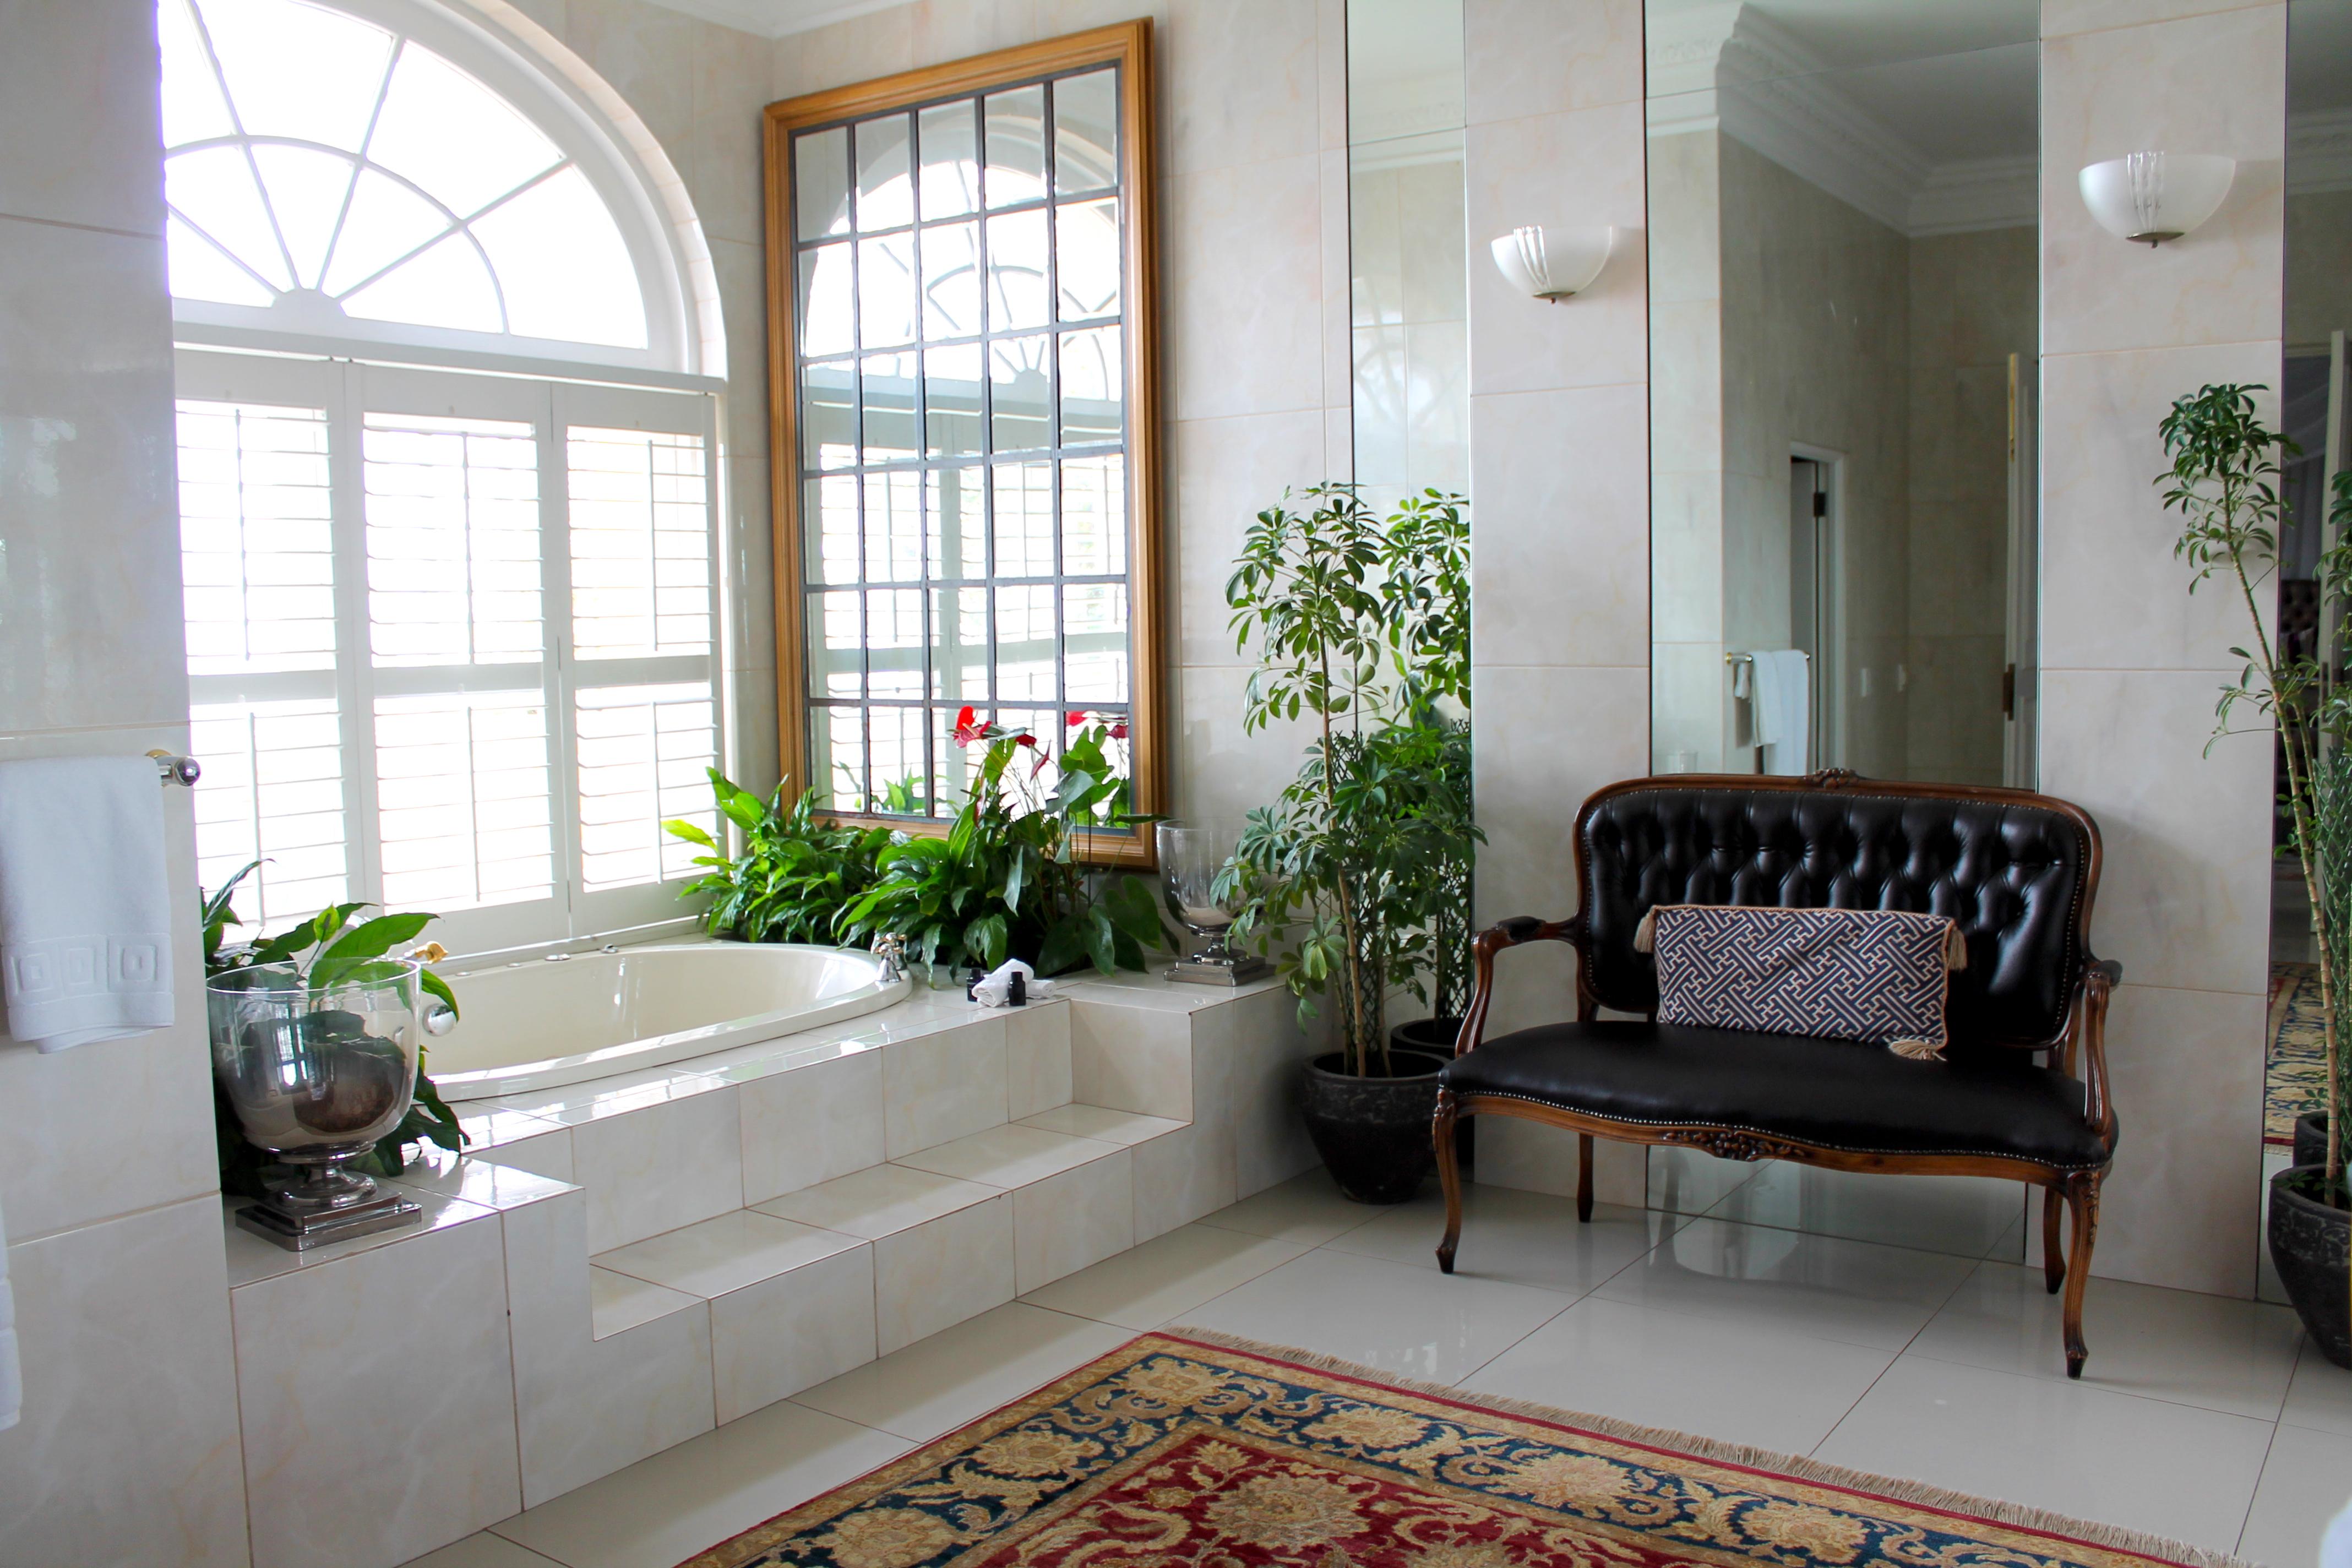 munro-hotel-bathroom-johannesburg-lustforthesublime